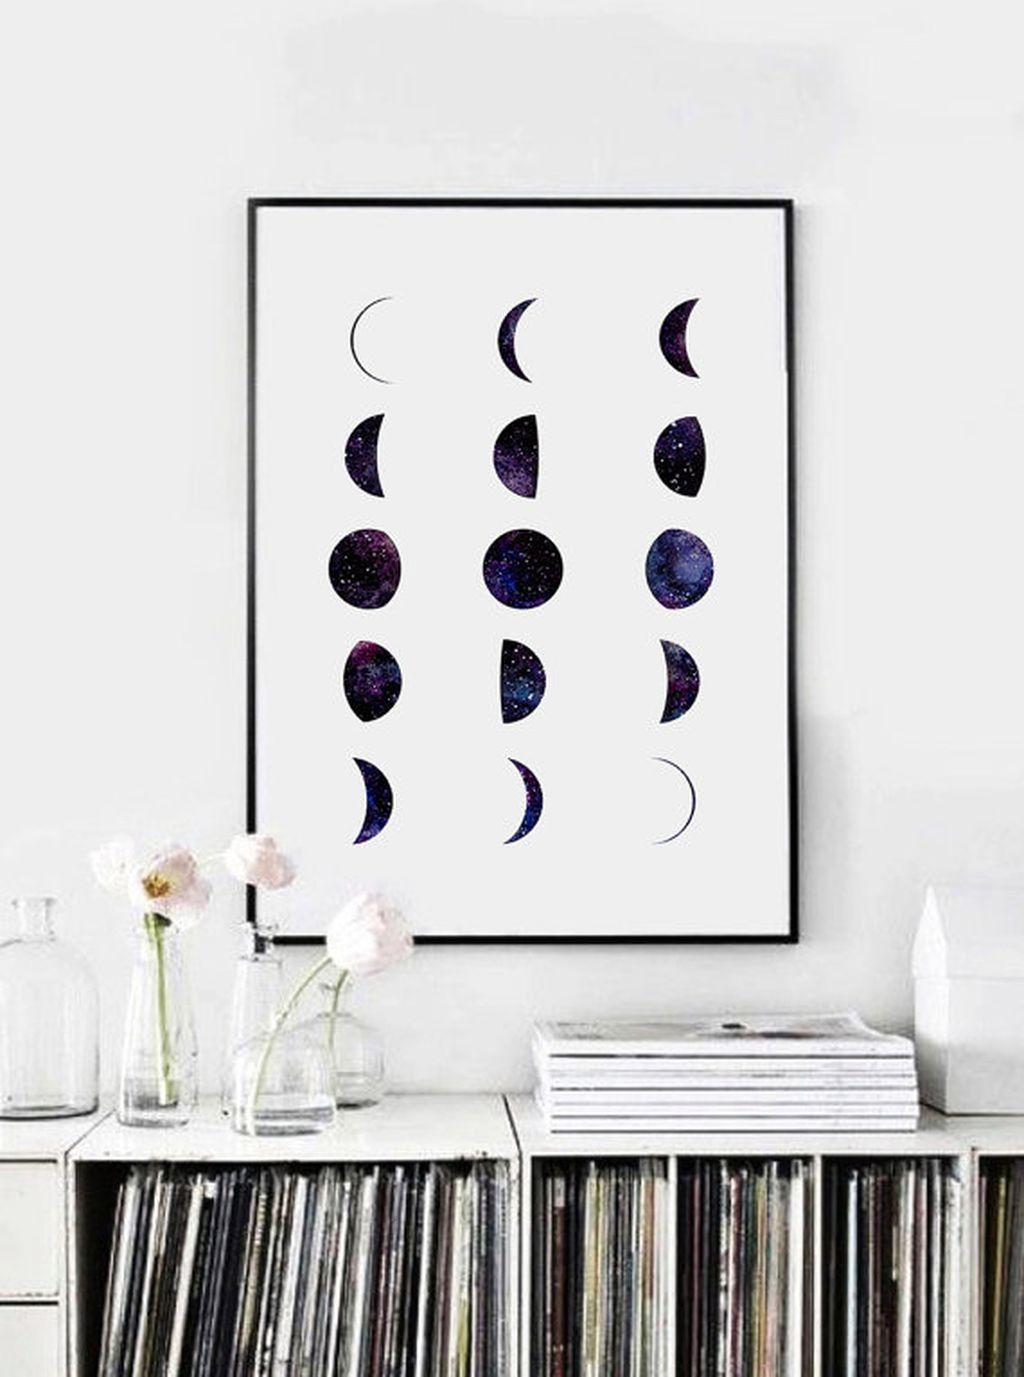 minimalist bedroom decor ideas to make you will feel comfortable